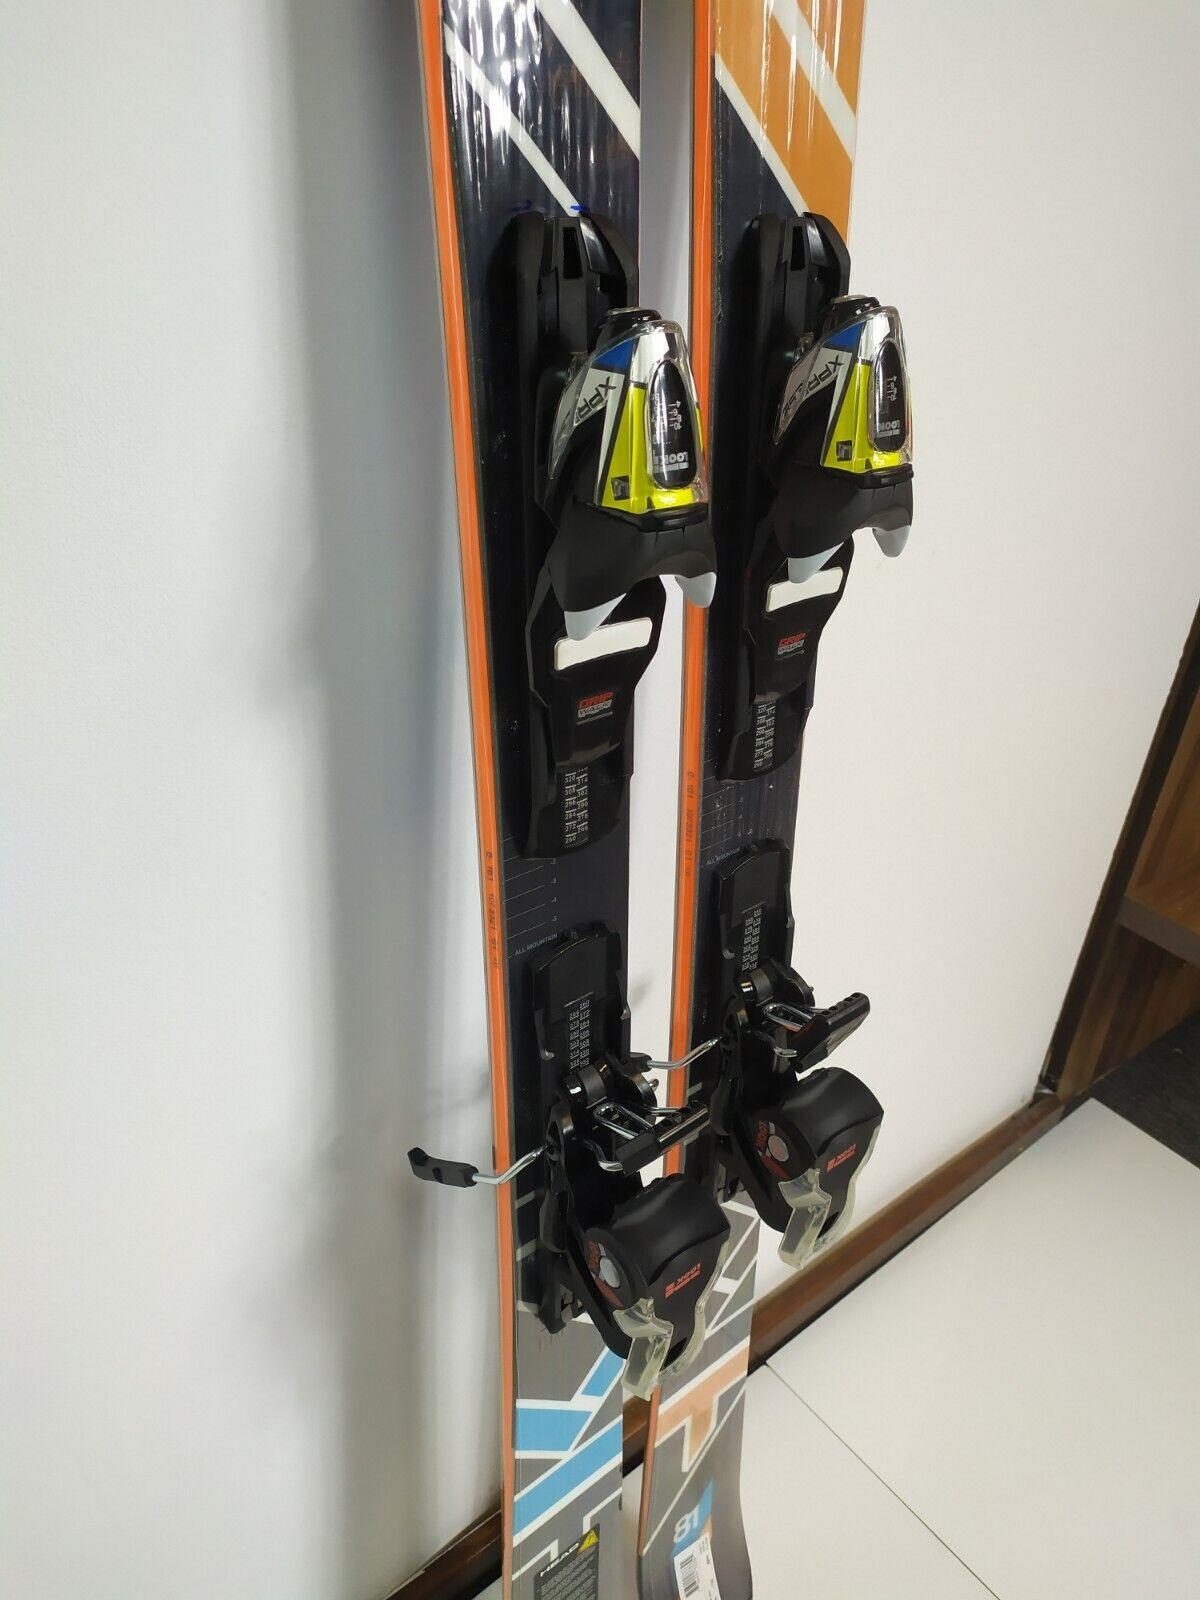 как выглядит NEW HEAD The Jr Caddy SW 161 cm Ski NEW Look Xpress 11 Bindings Park Freestyle фото